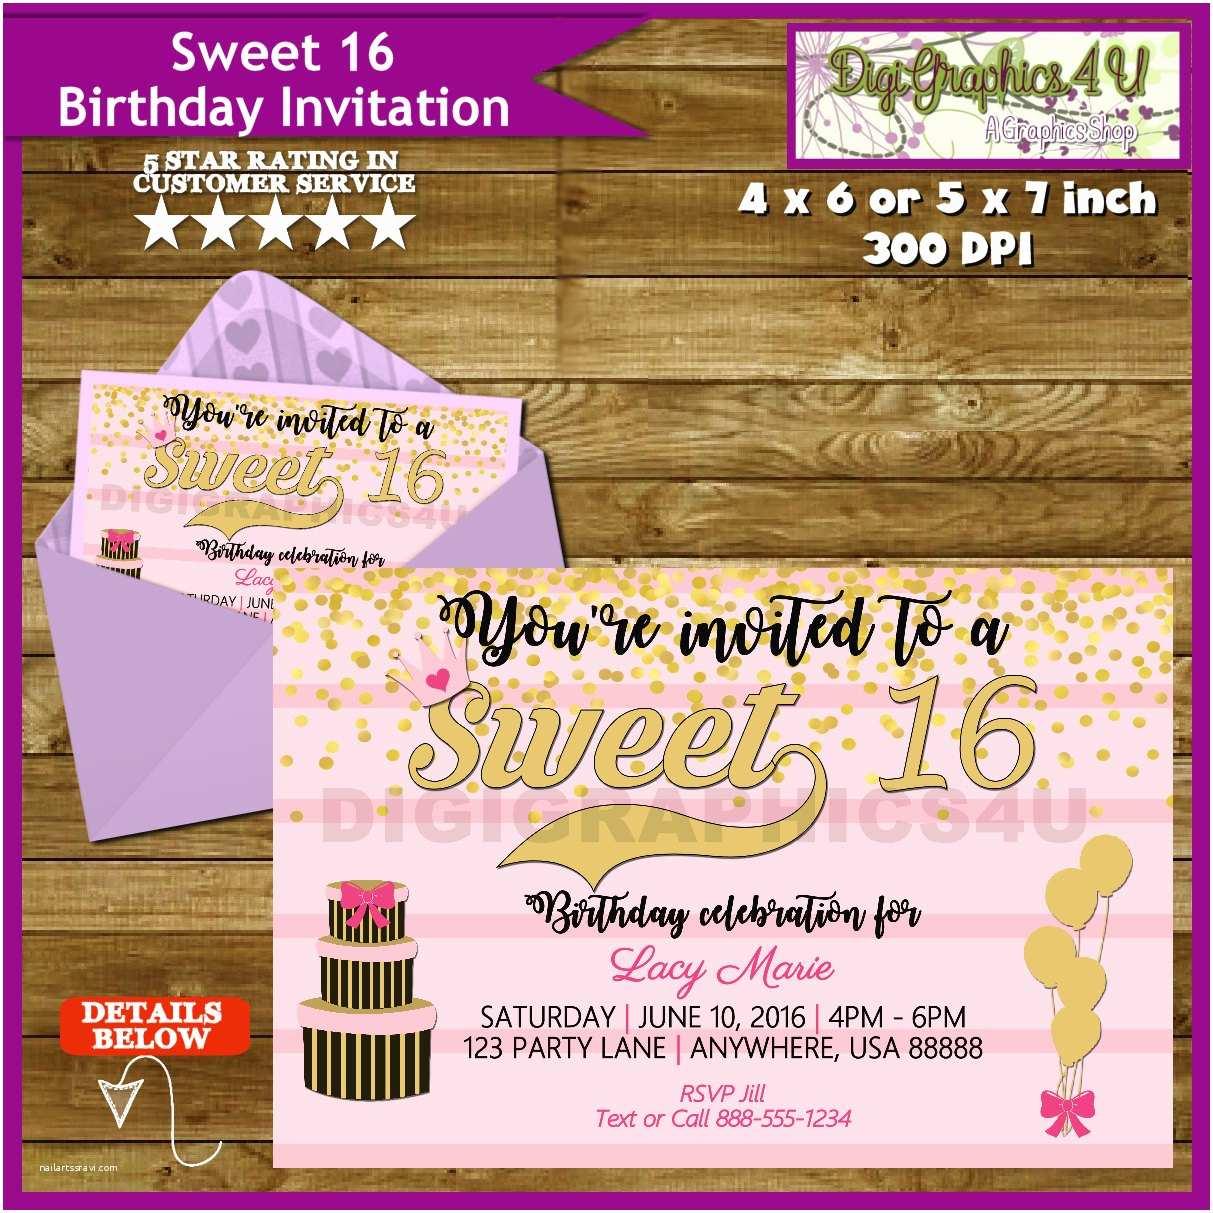 Sweet 16 Birthday Invitations Sweet 16 Sixteen 16th Birthday Party Invitation